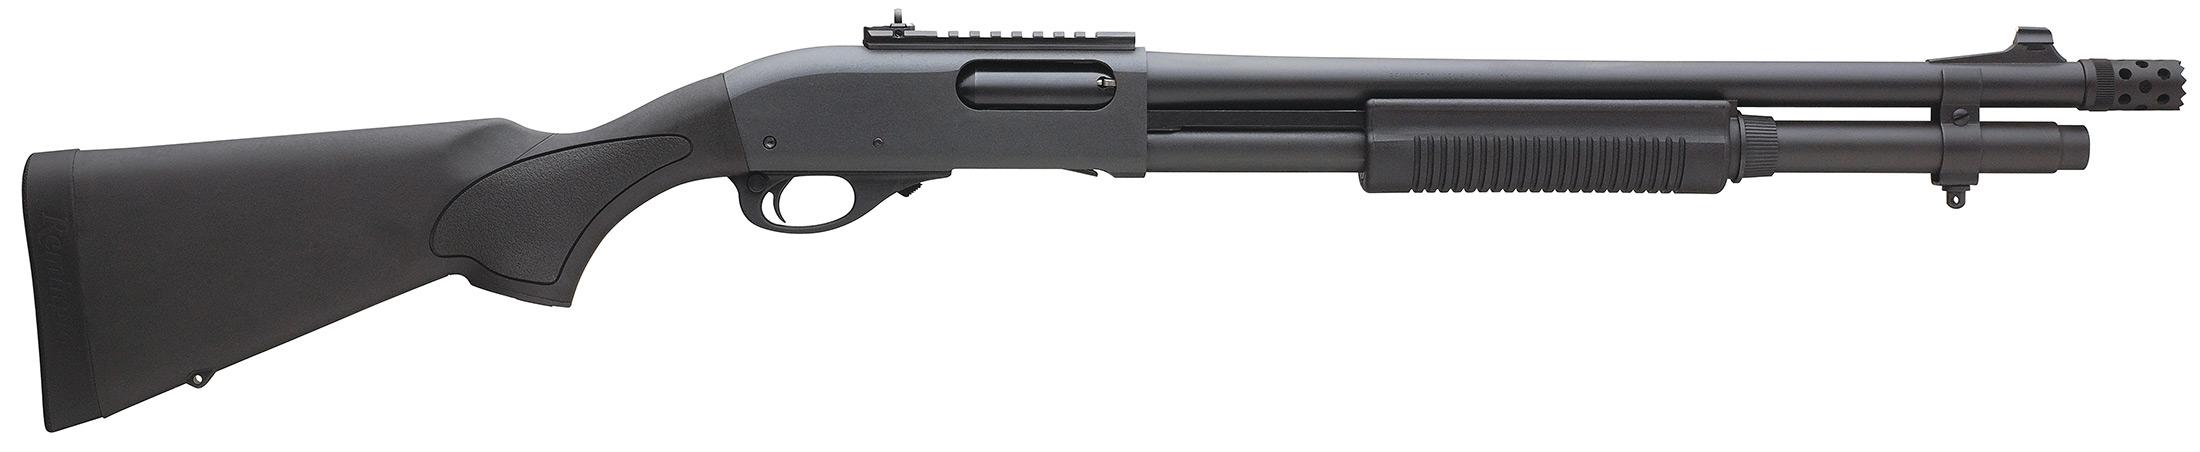 Escopeta Remington 870.